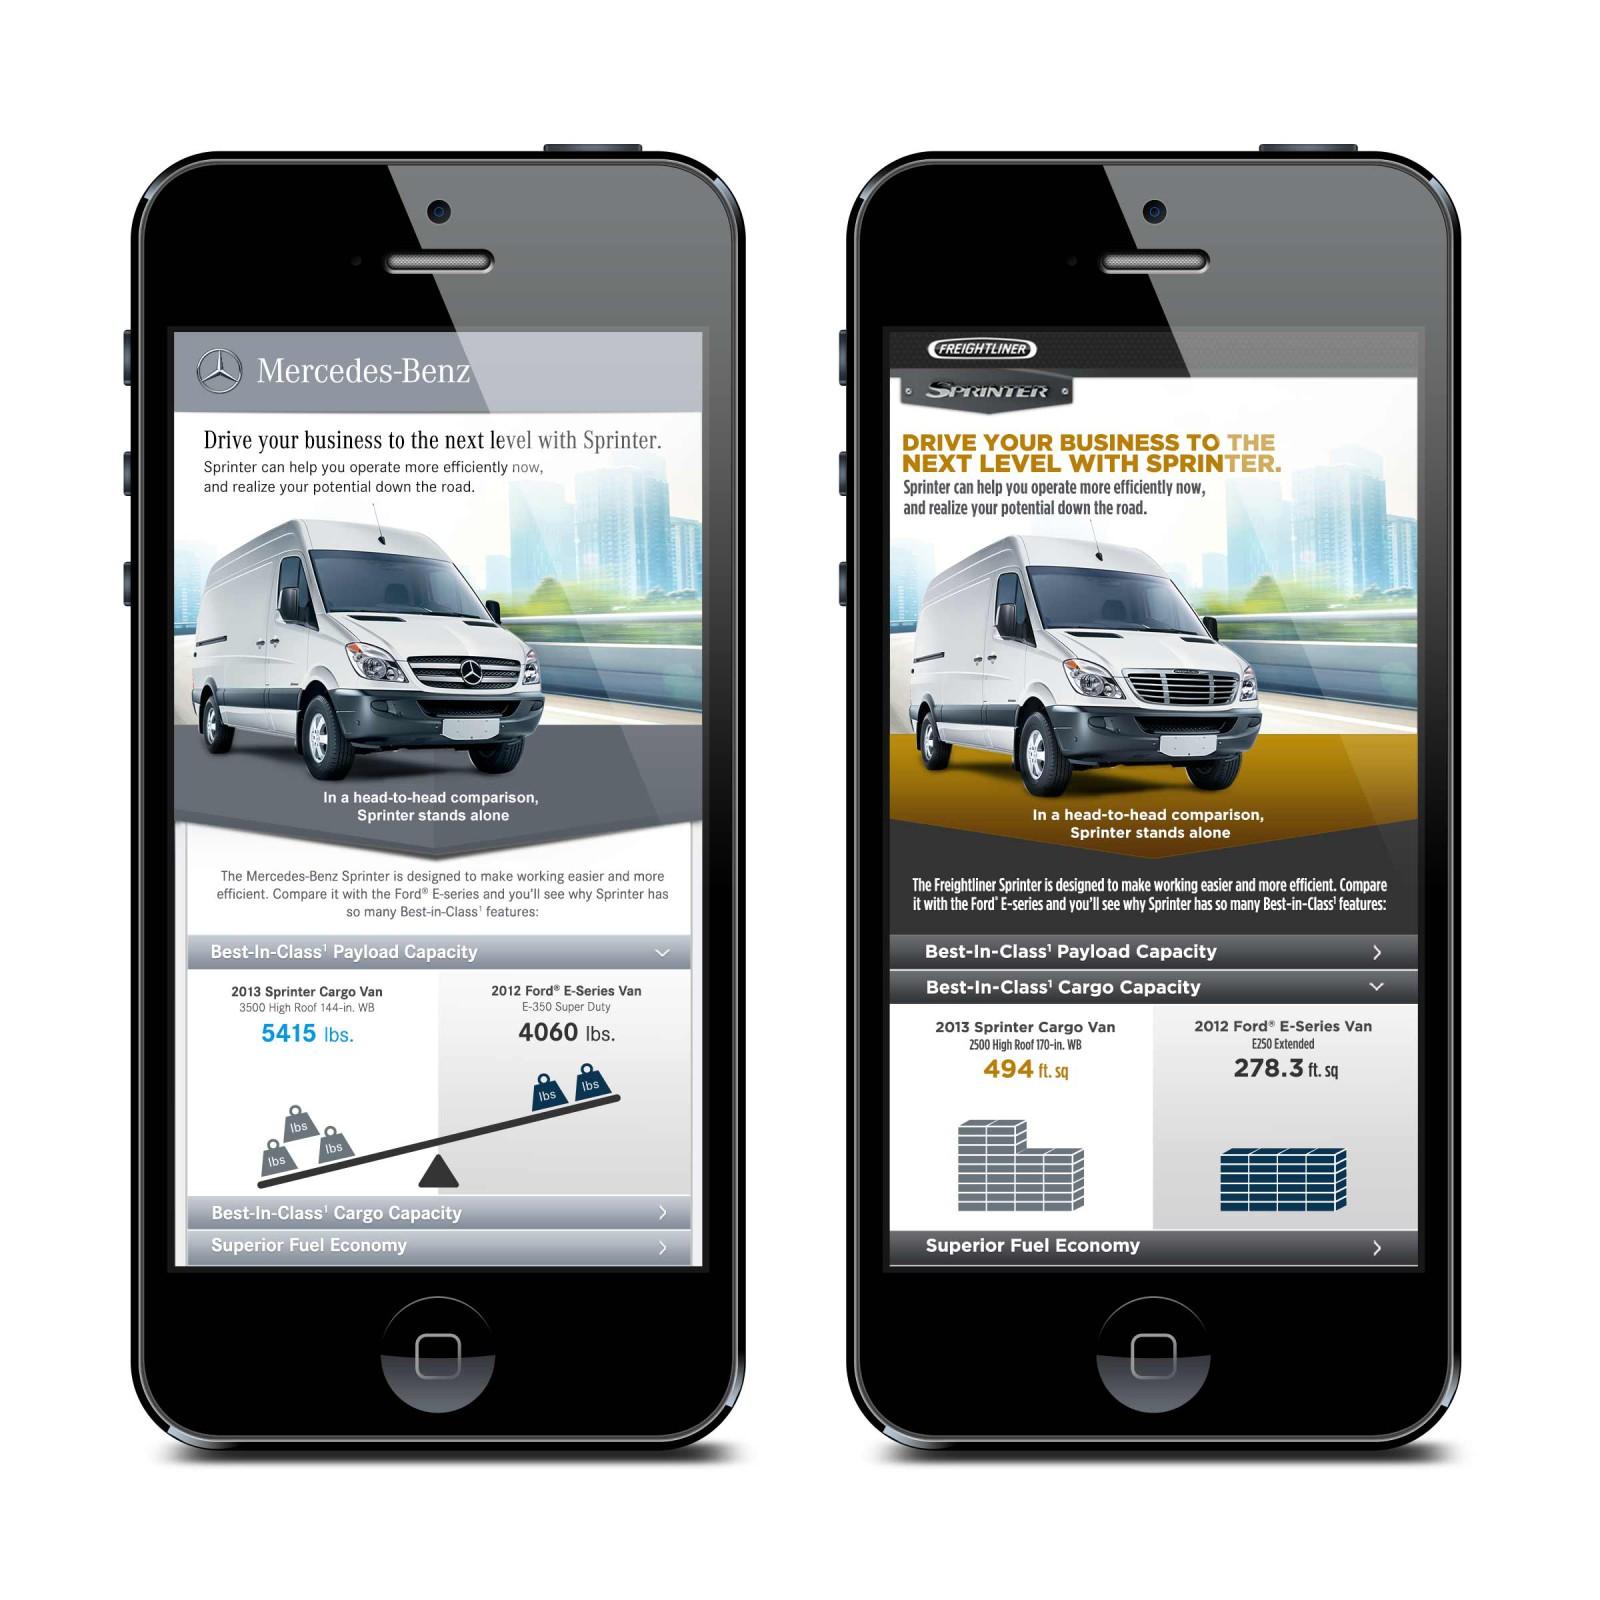 Sprinter-Head-to-Head-mobile